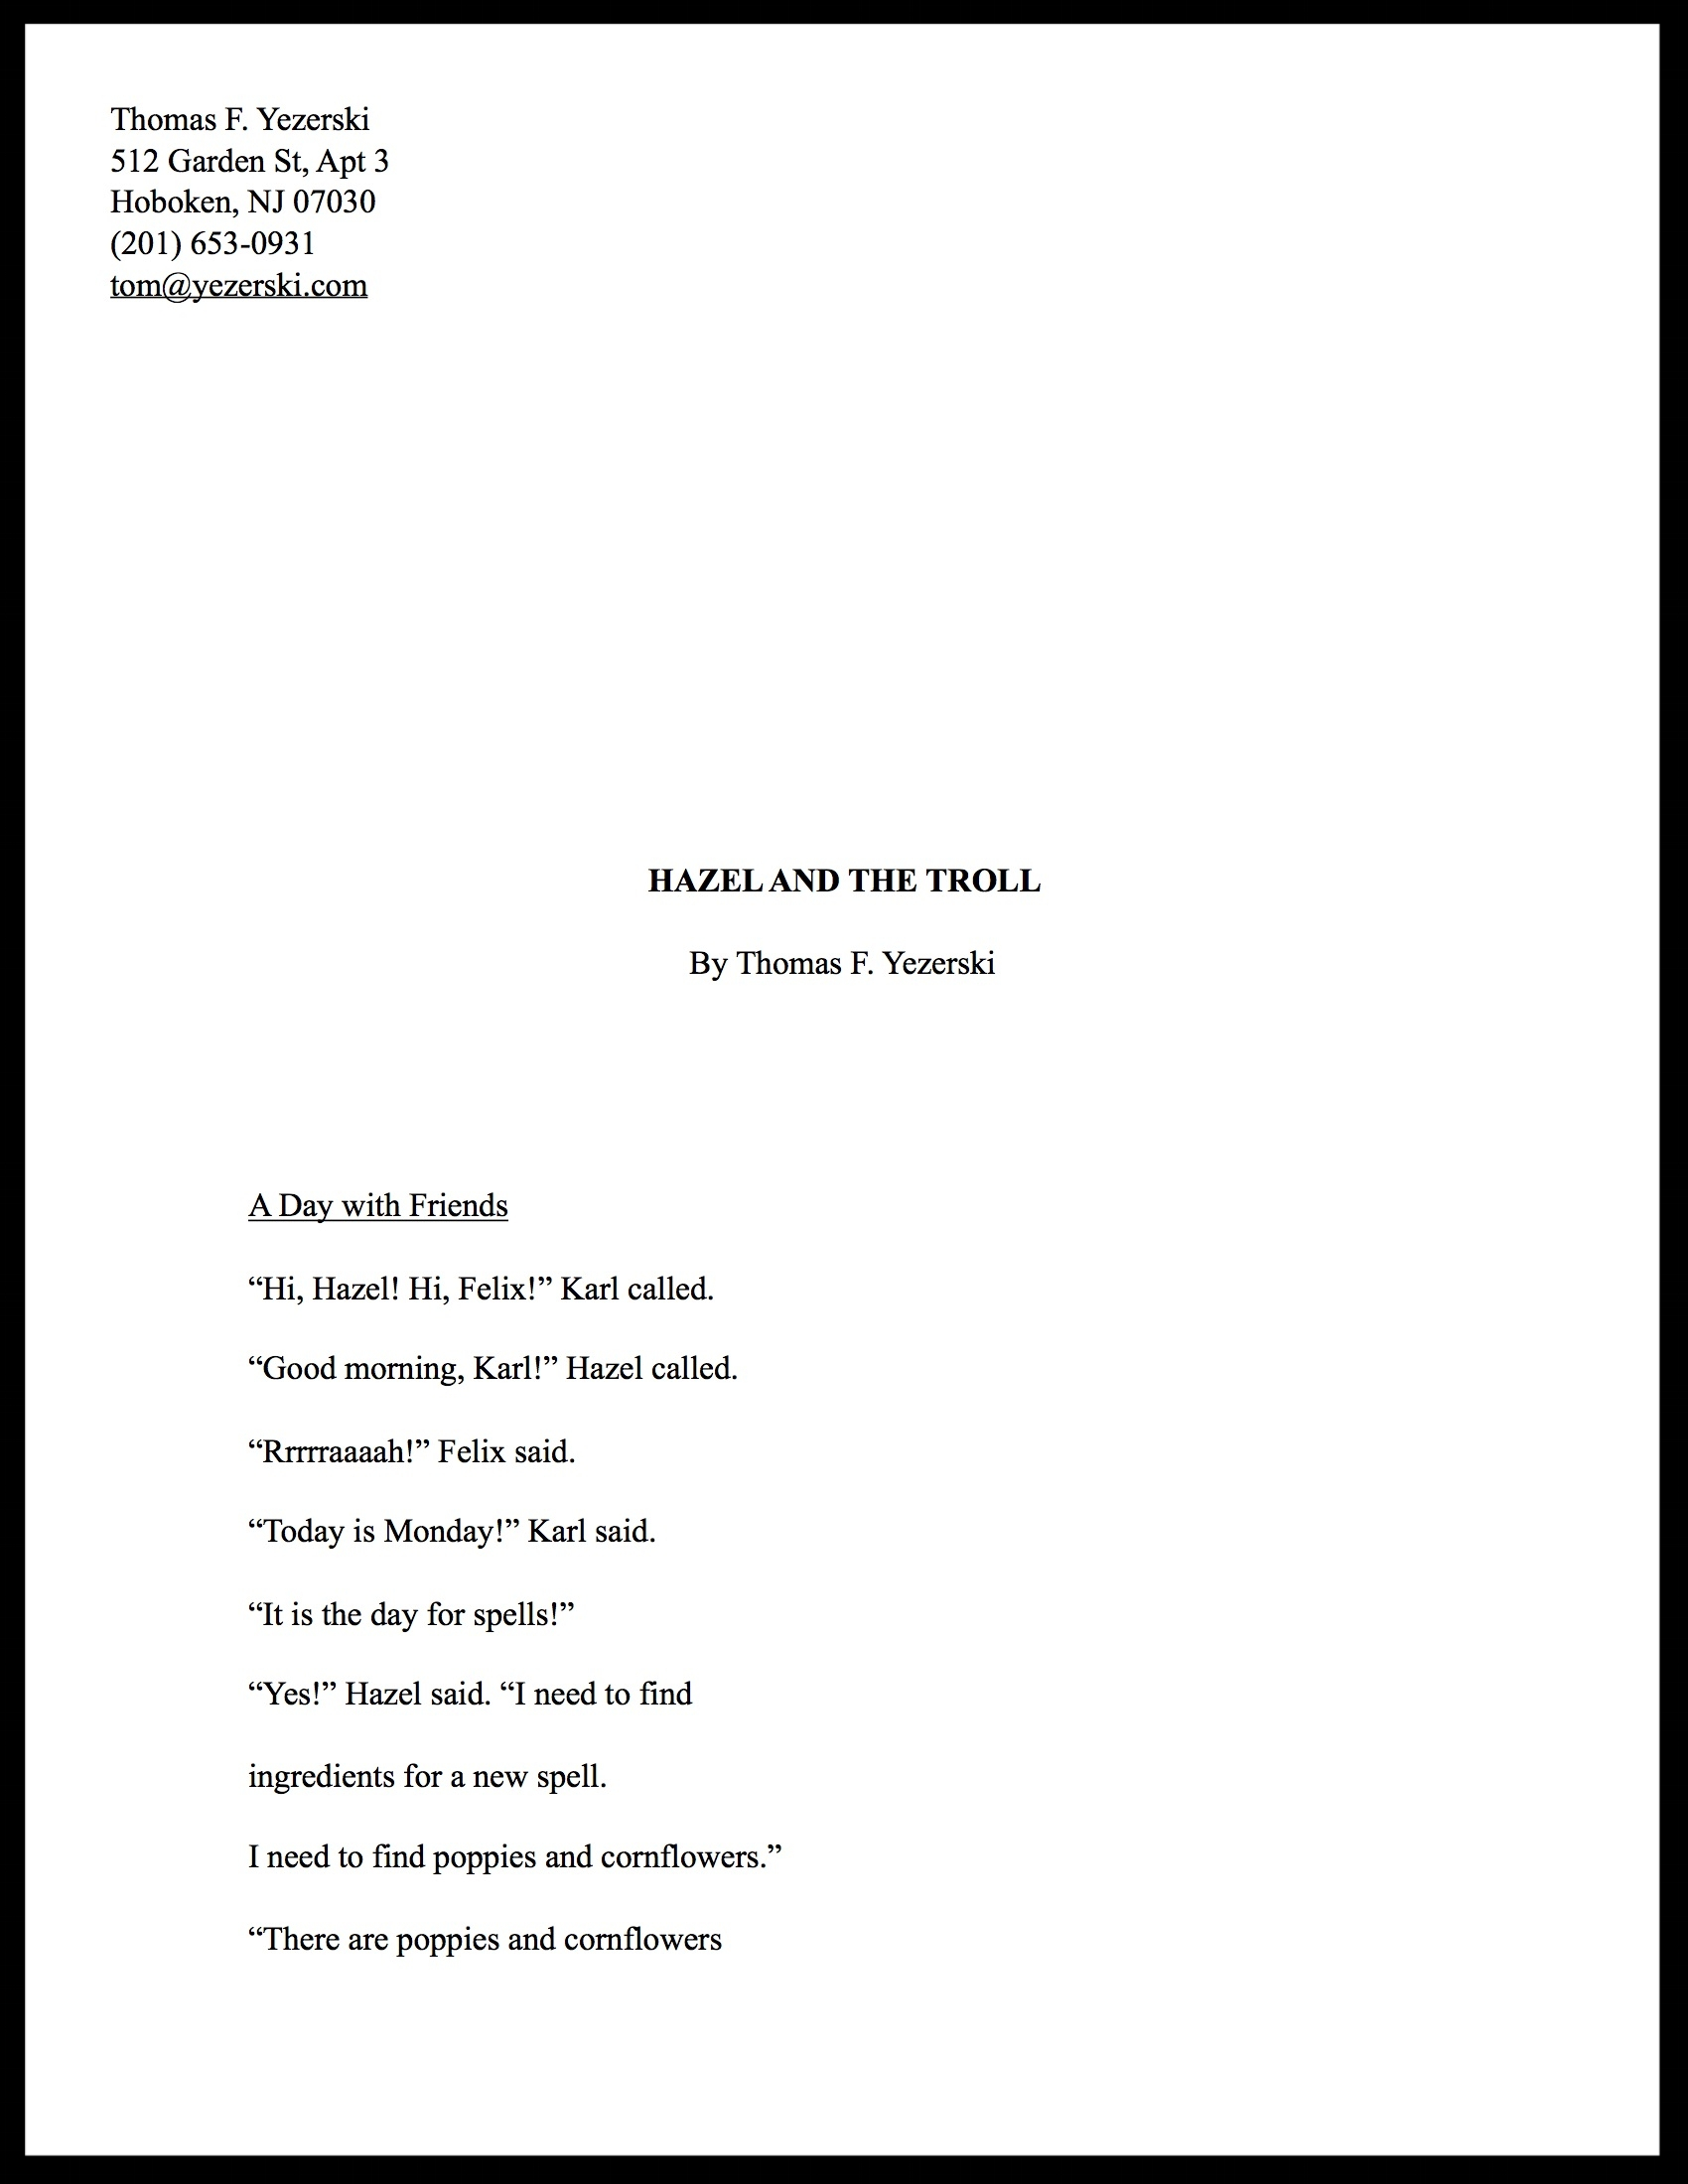 Hazel and the Troll (Manuscript)